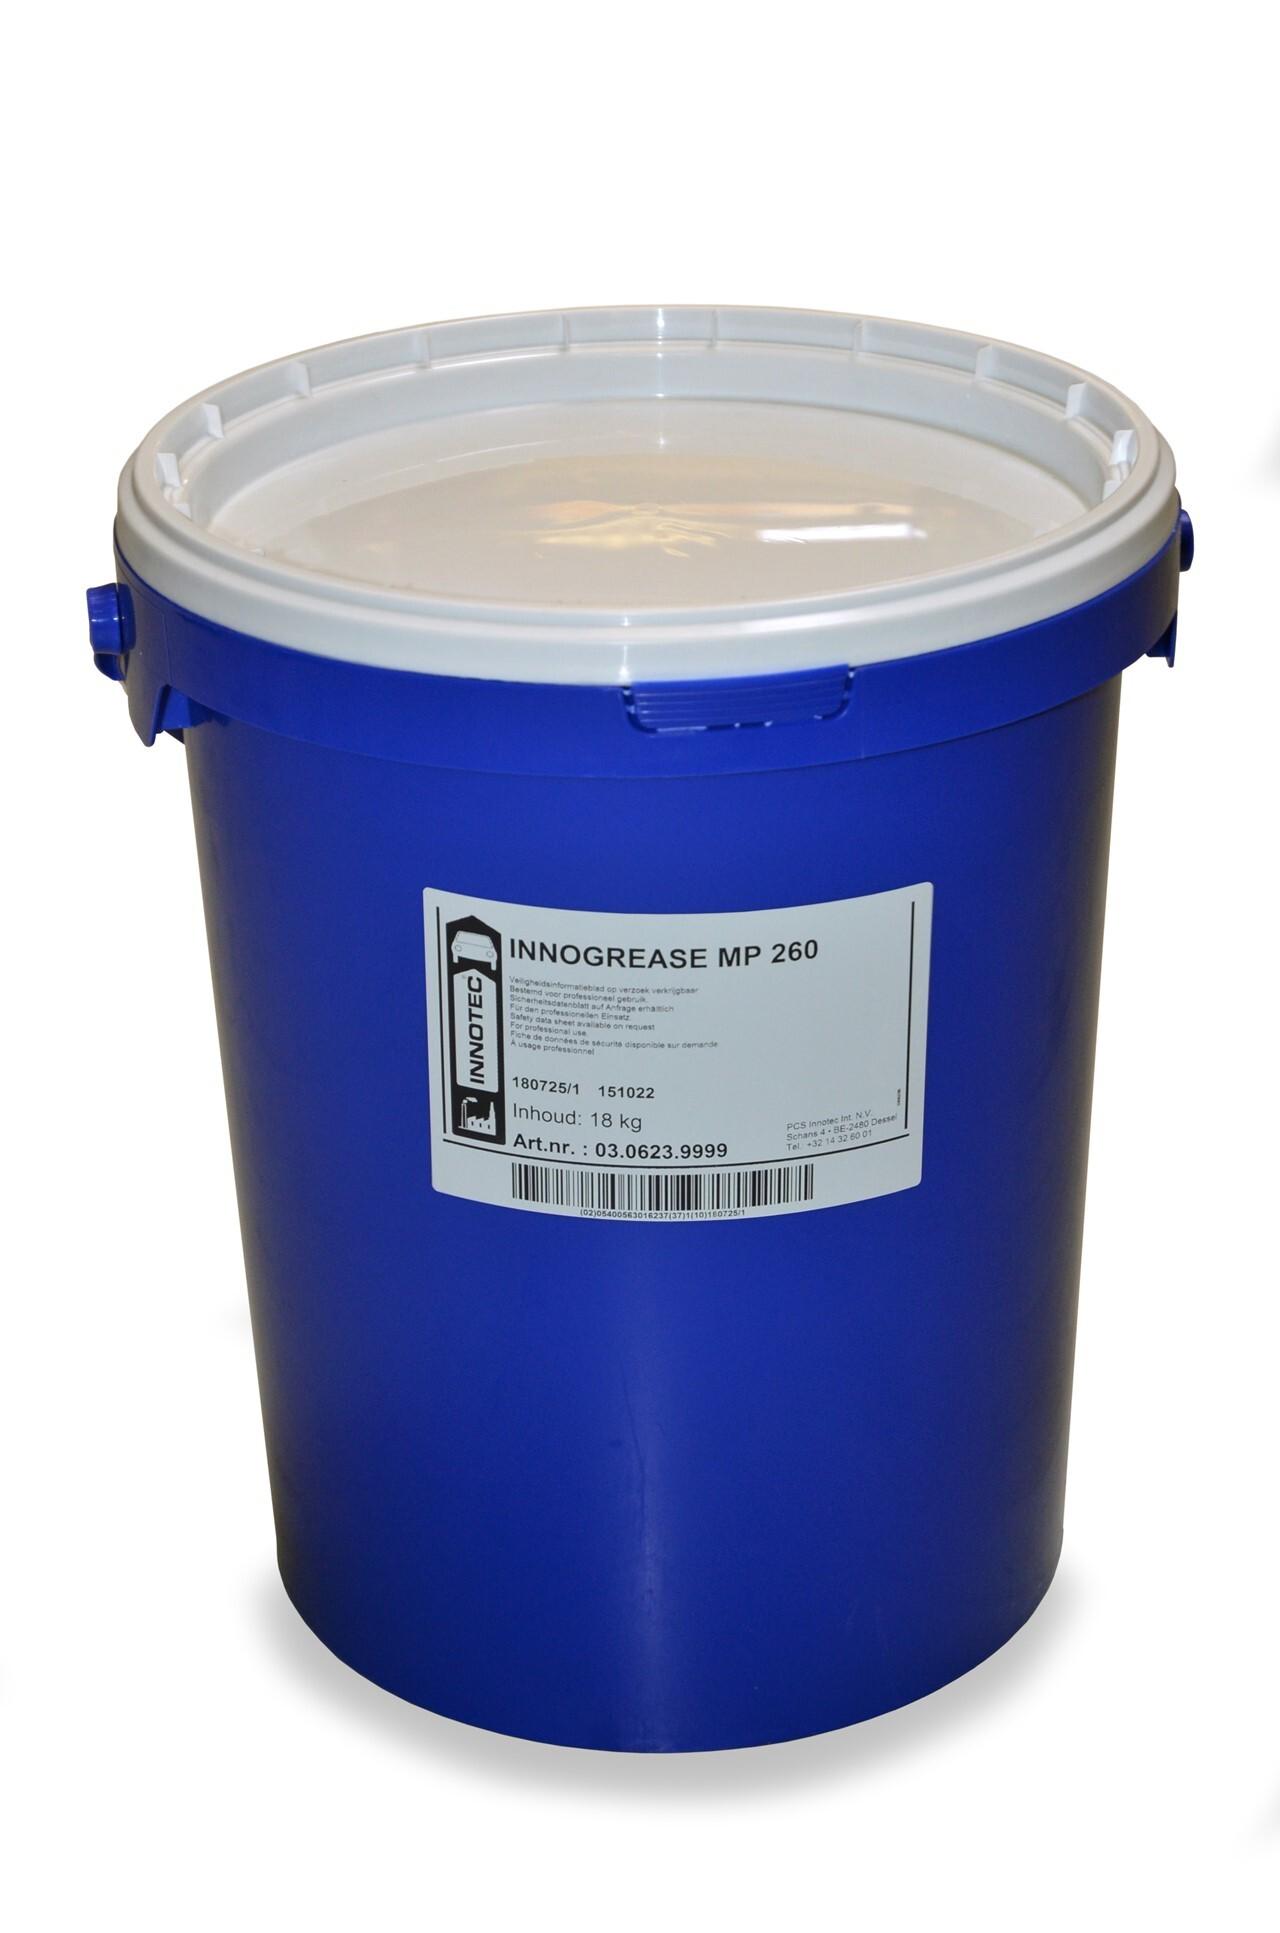 1775 Innogrease MP 260 18kg vat